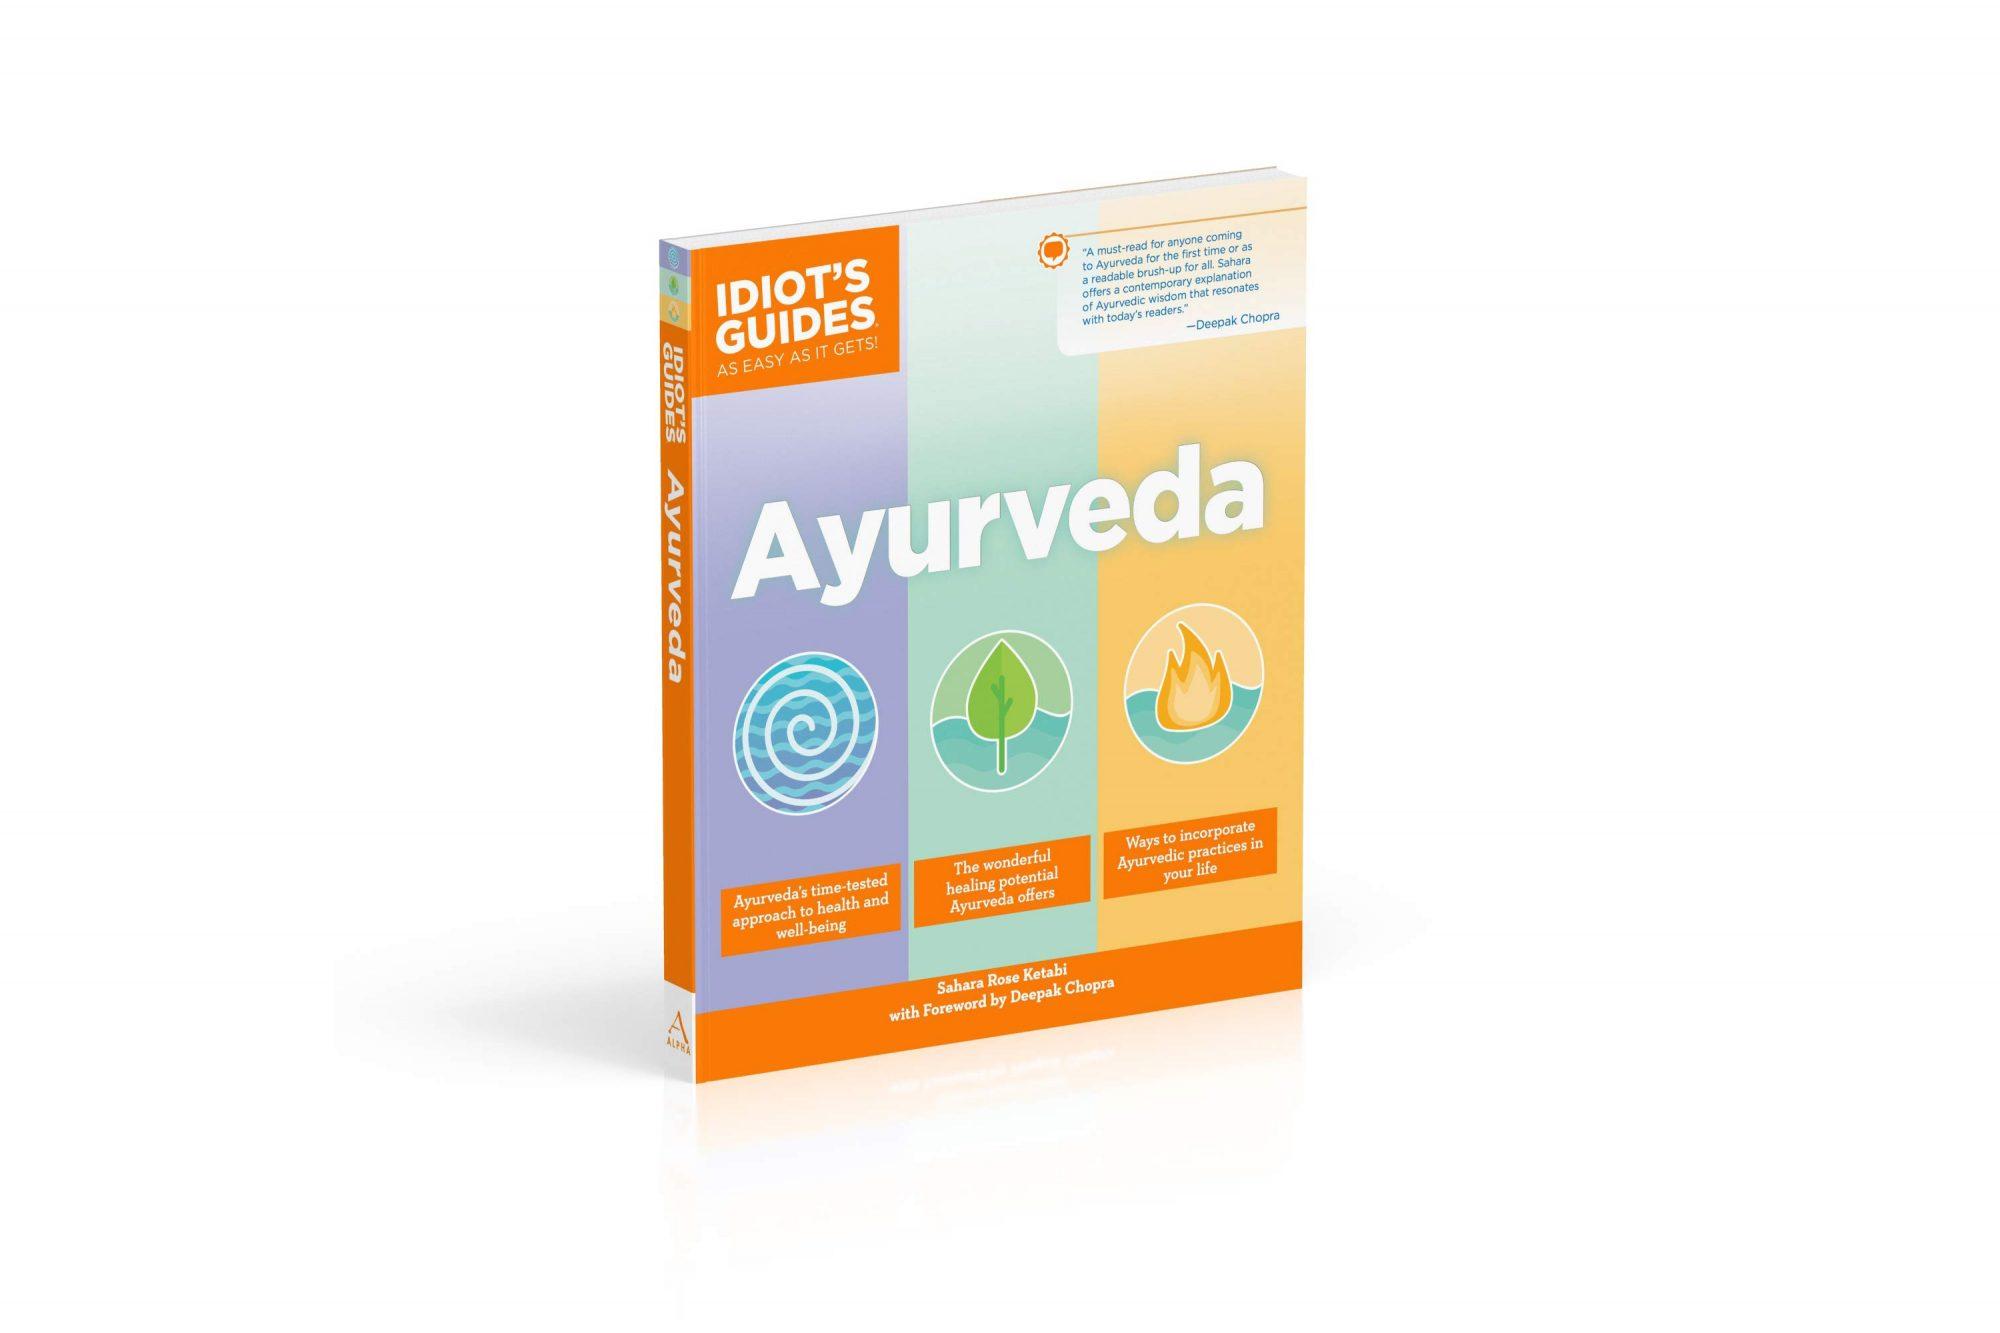 ayurveda ayruvedic beauty guide book